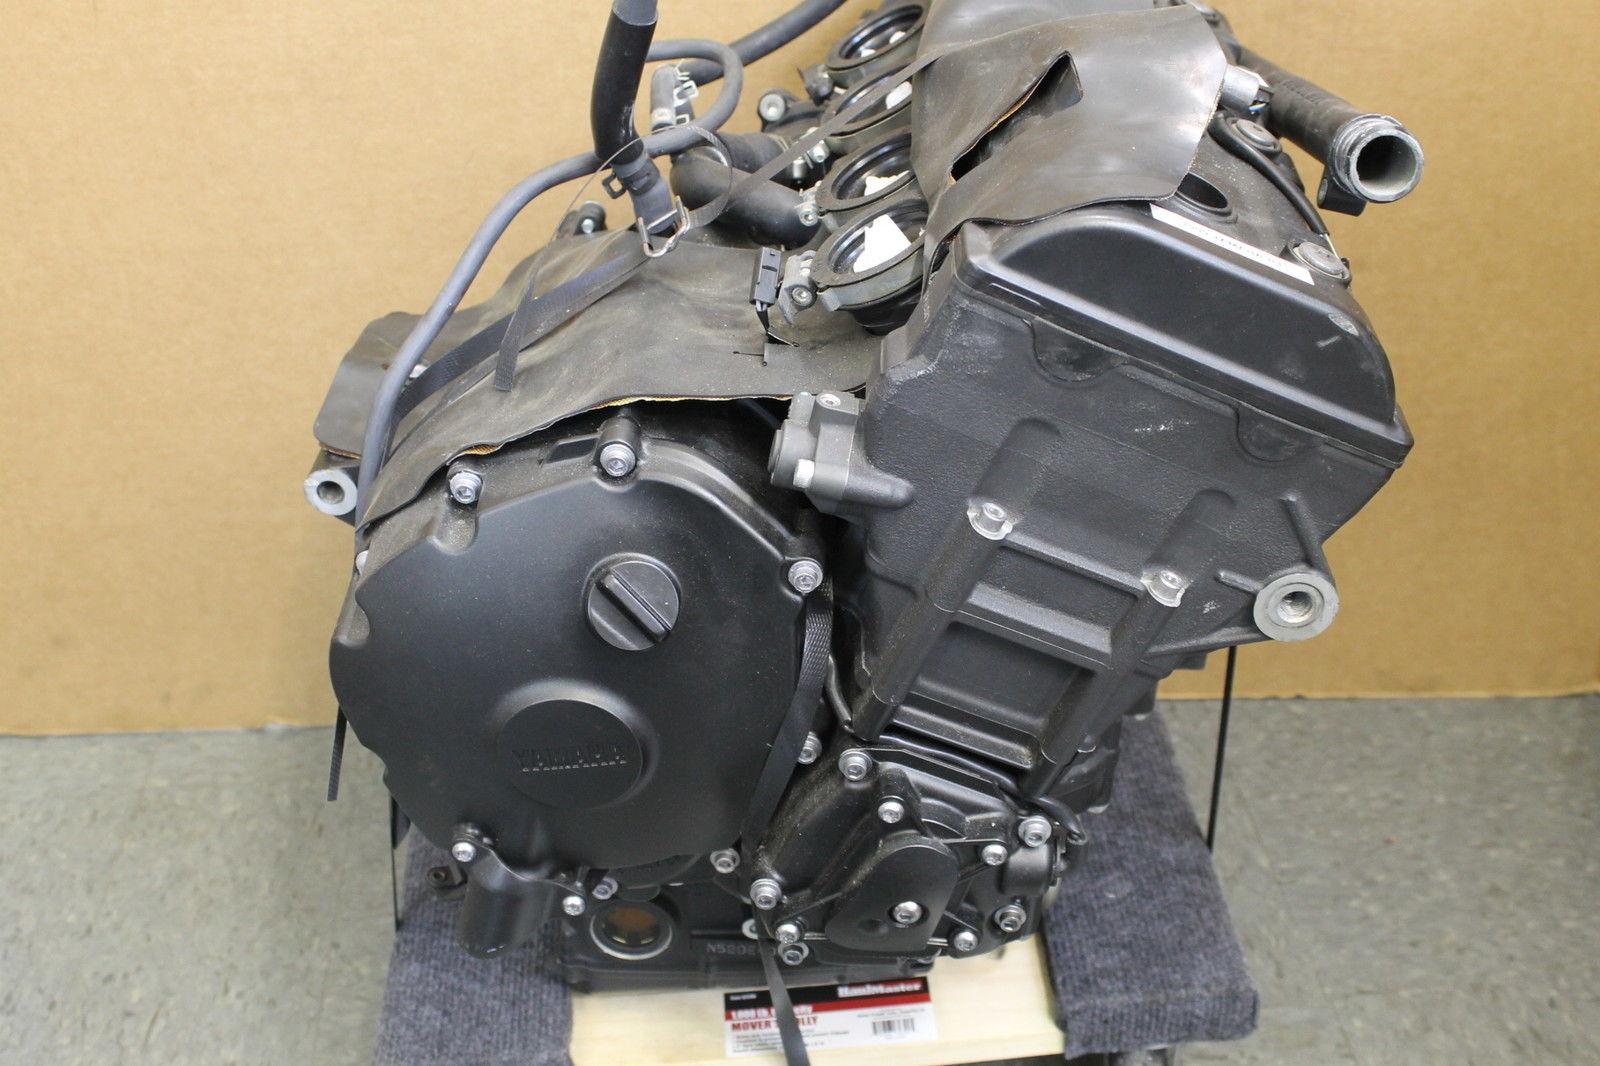 Pusat penjualan mesin motor copotan yamaha yzf r1 oem for Yamaha r1 oem parts